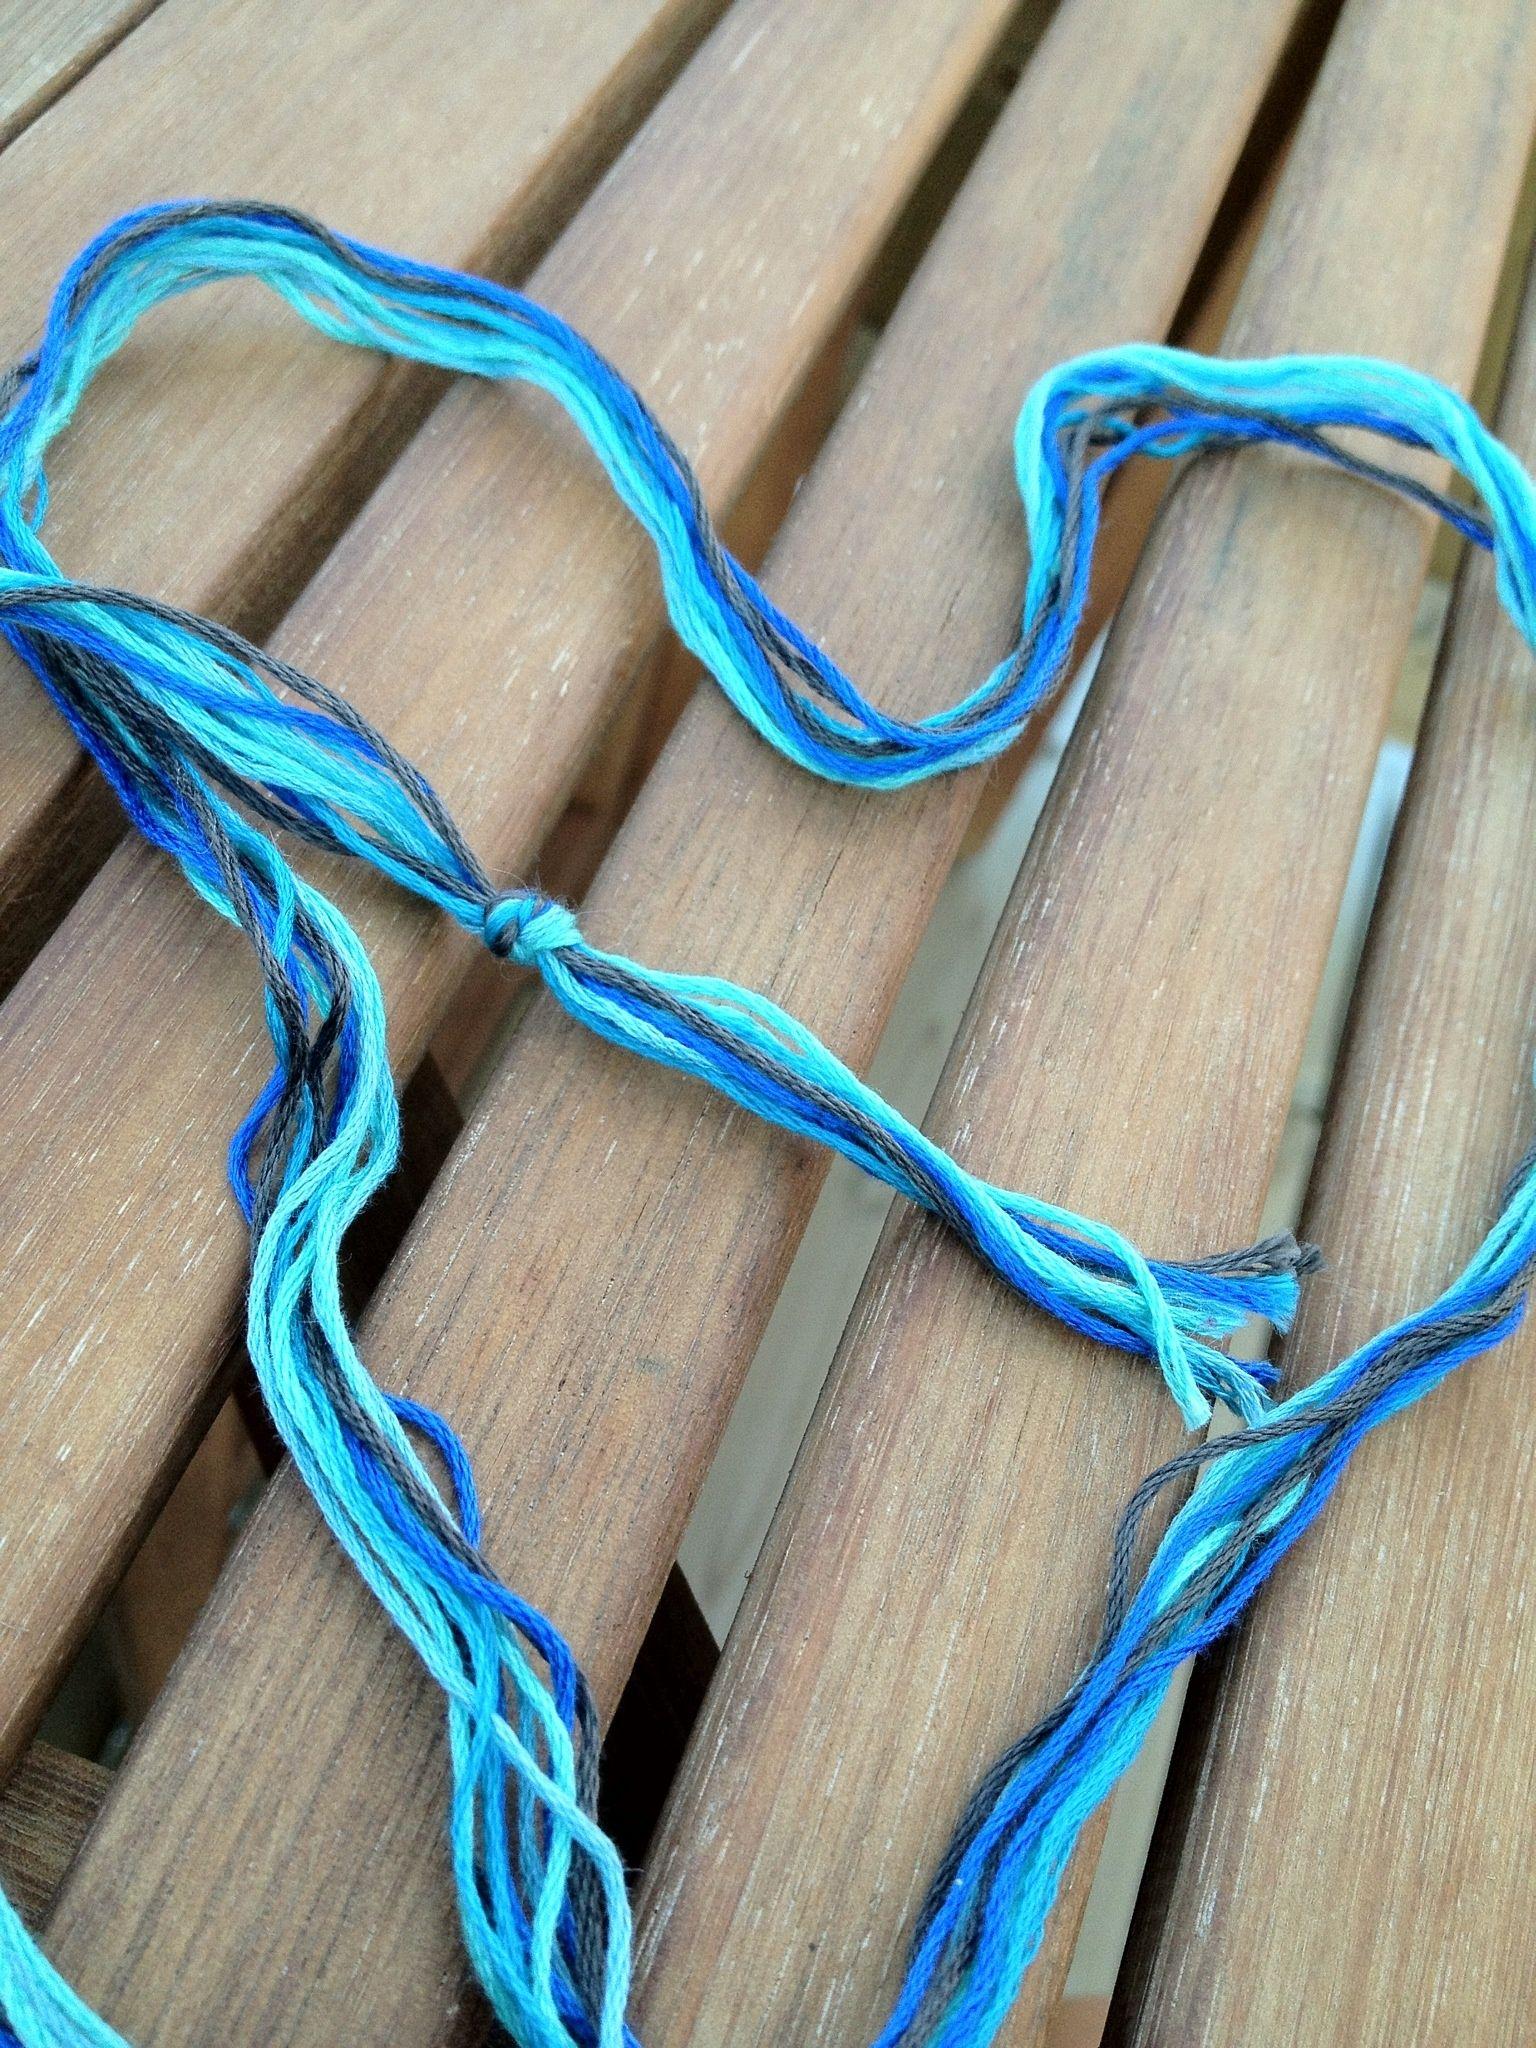 How To Make A Chevron Friendship Bracelet B C Guides